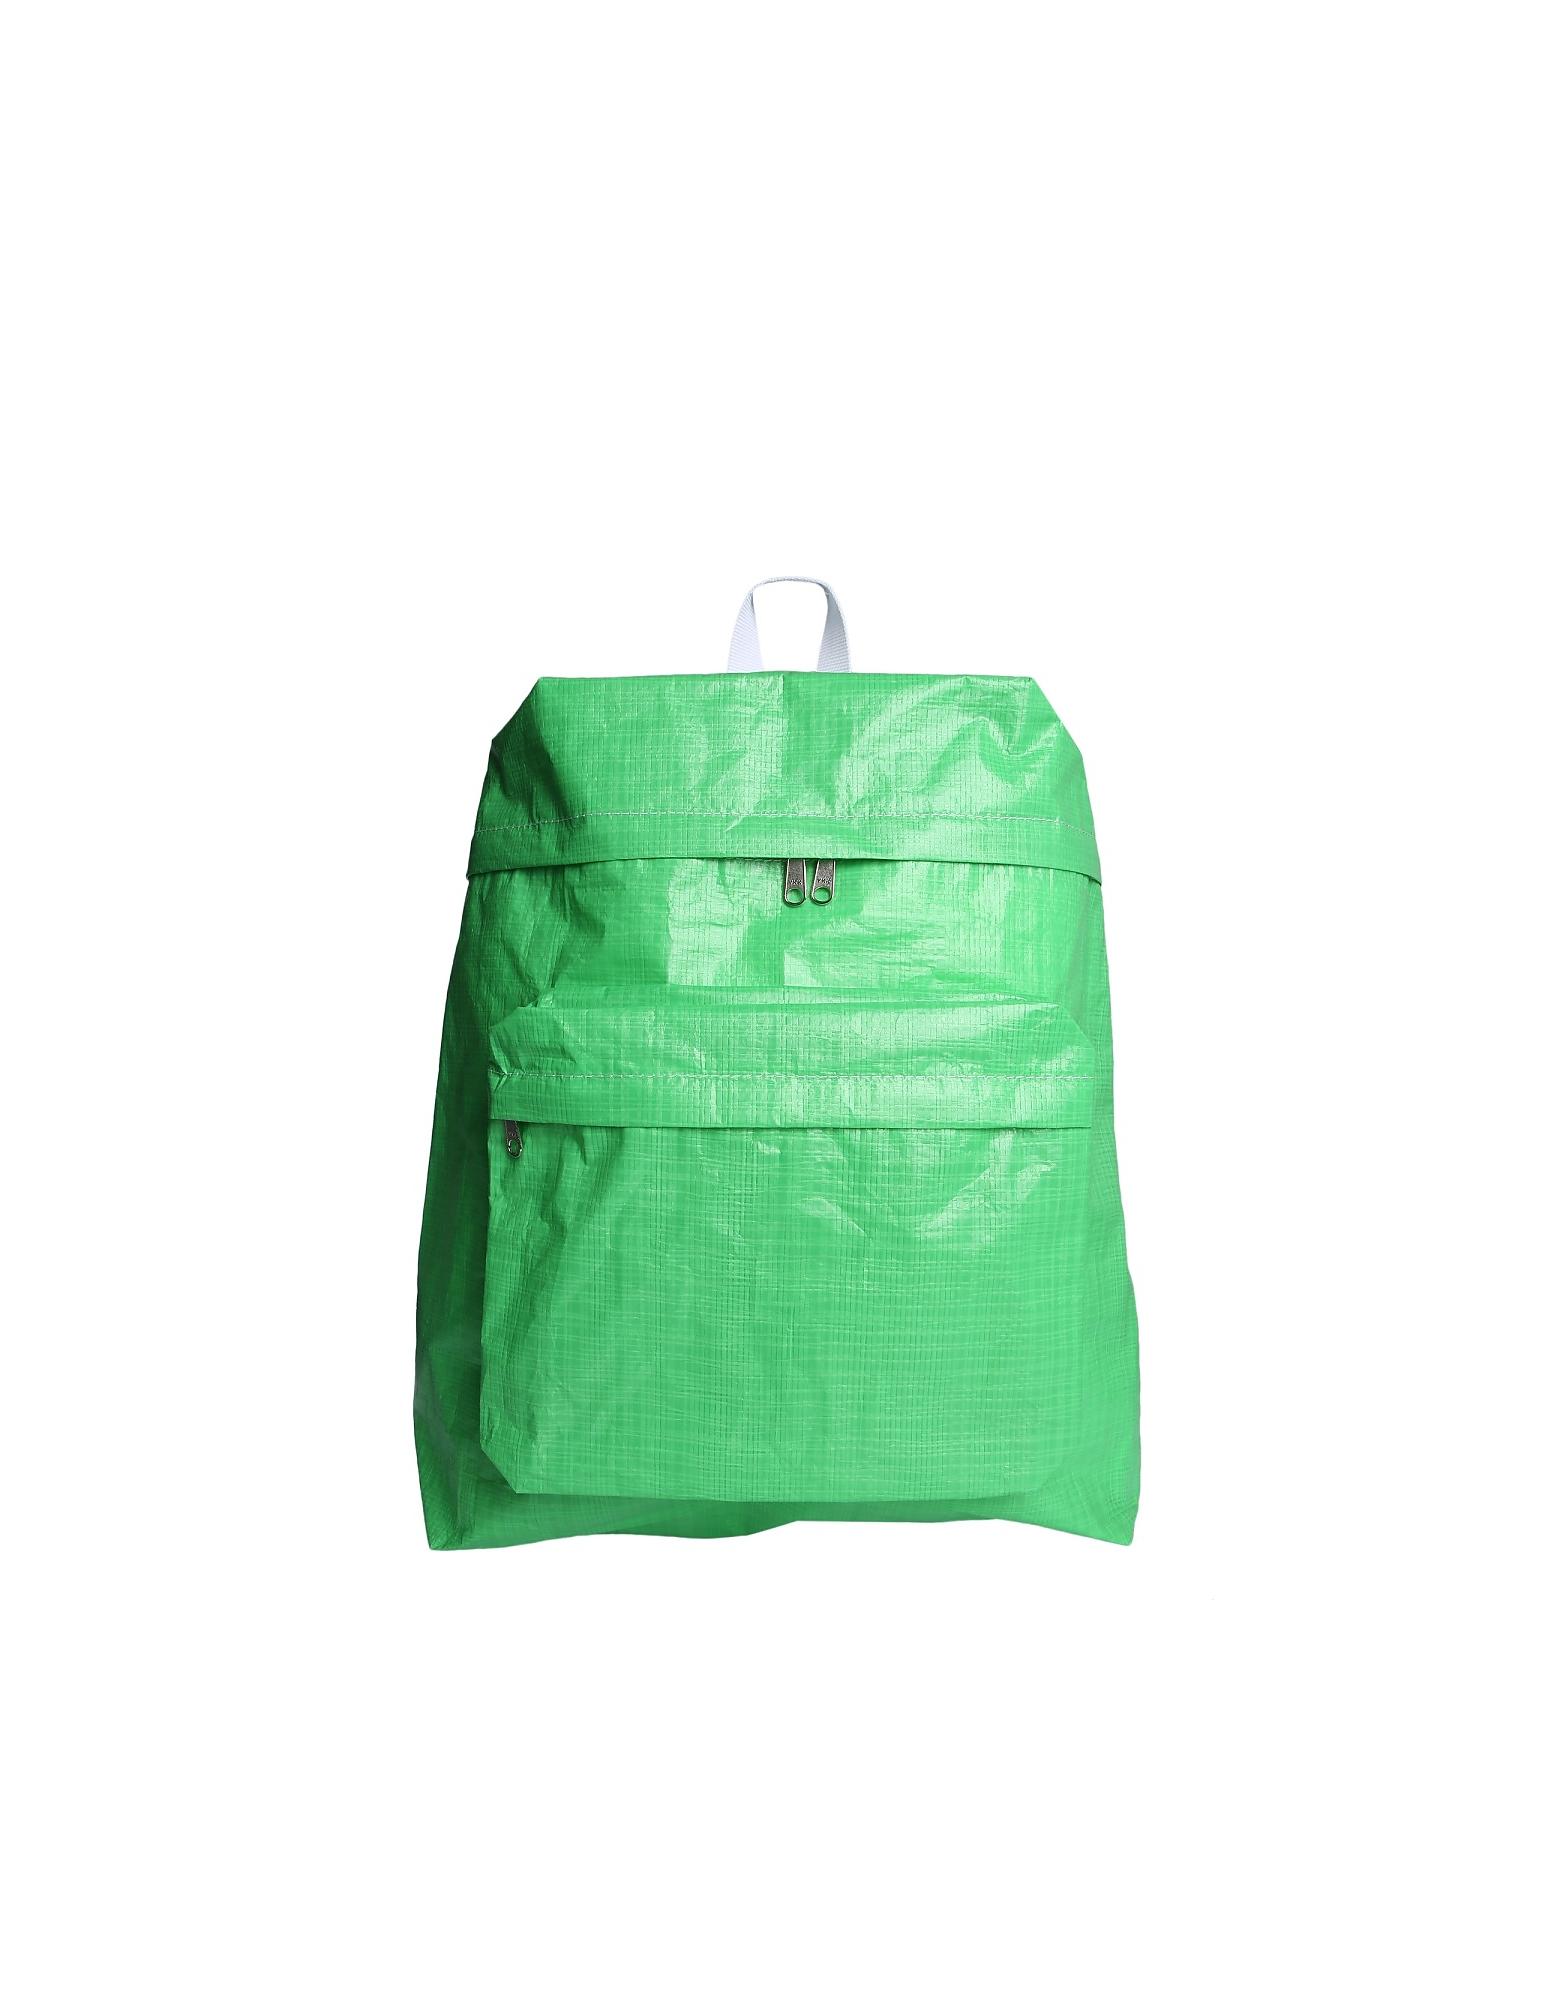 Comme des Garçons Designer Men's Bags, Backpack In Technical Fabric